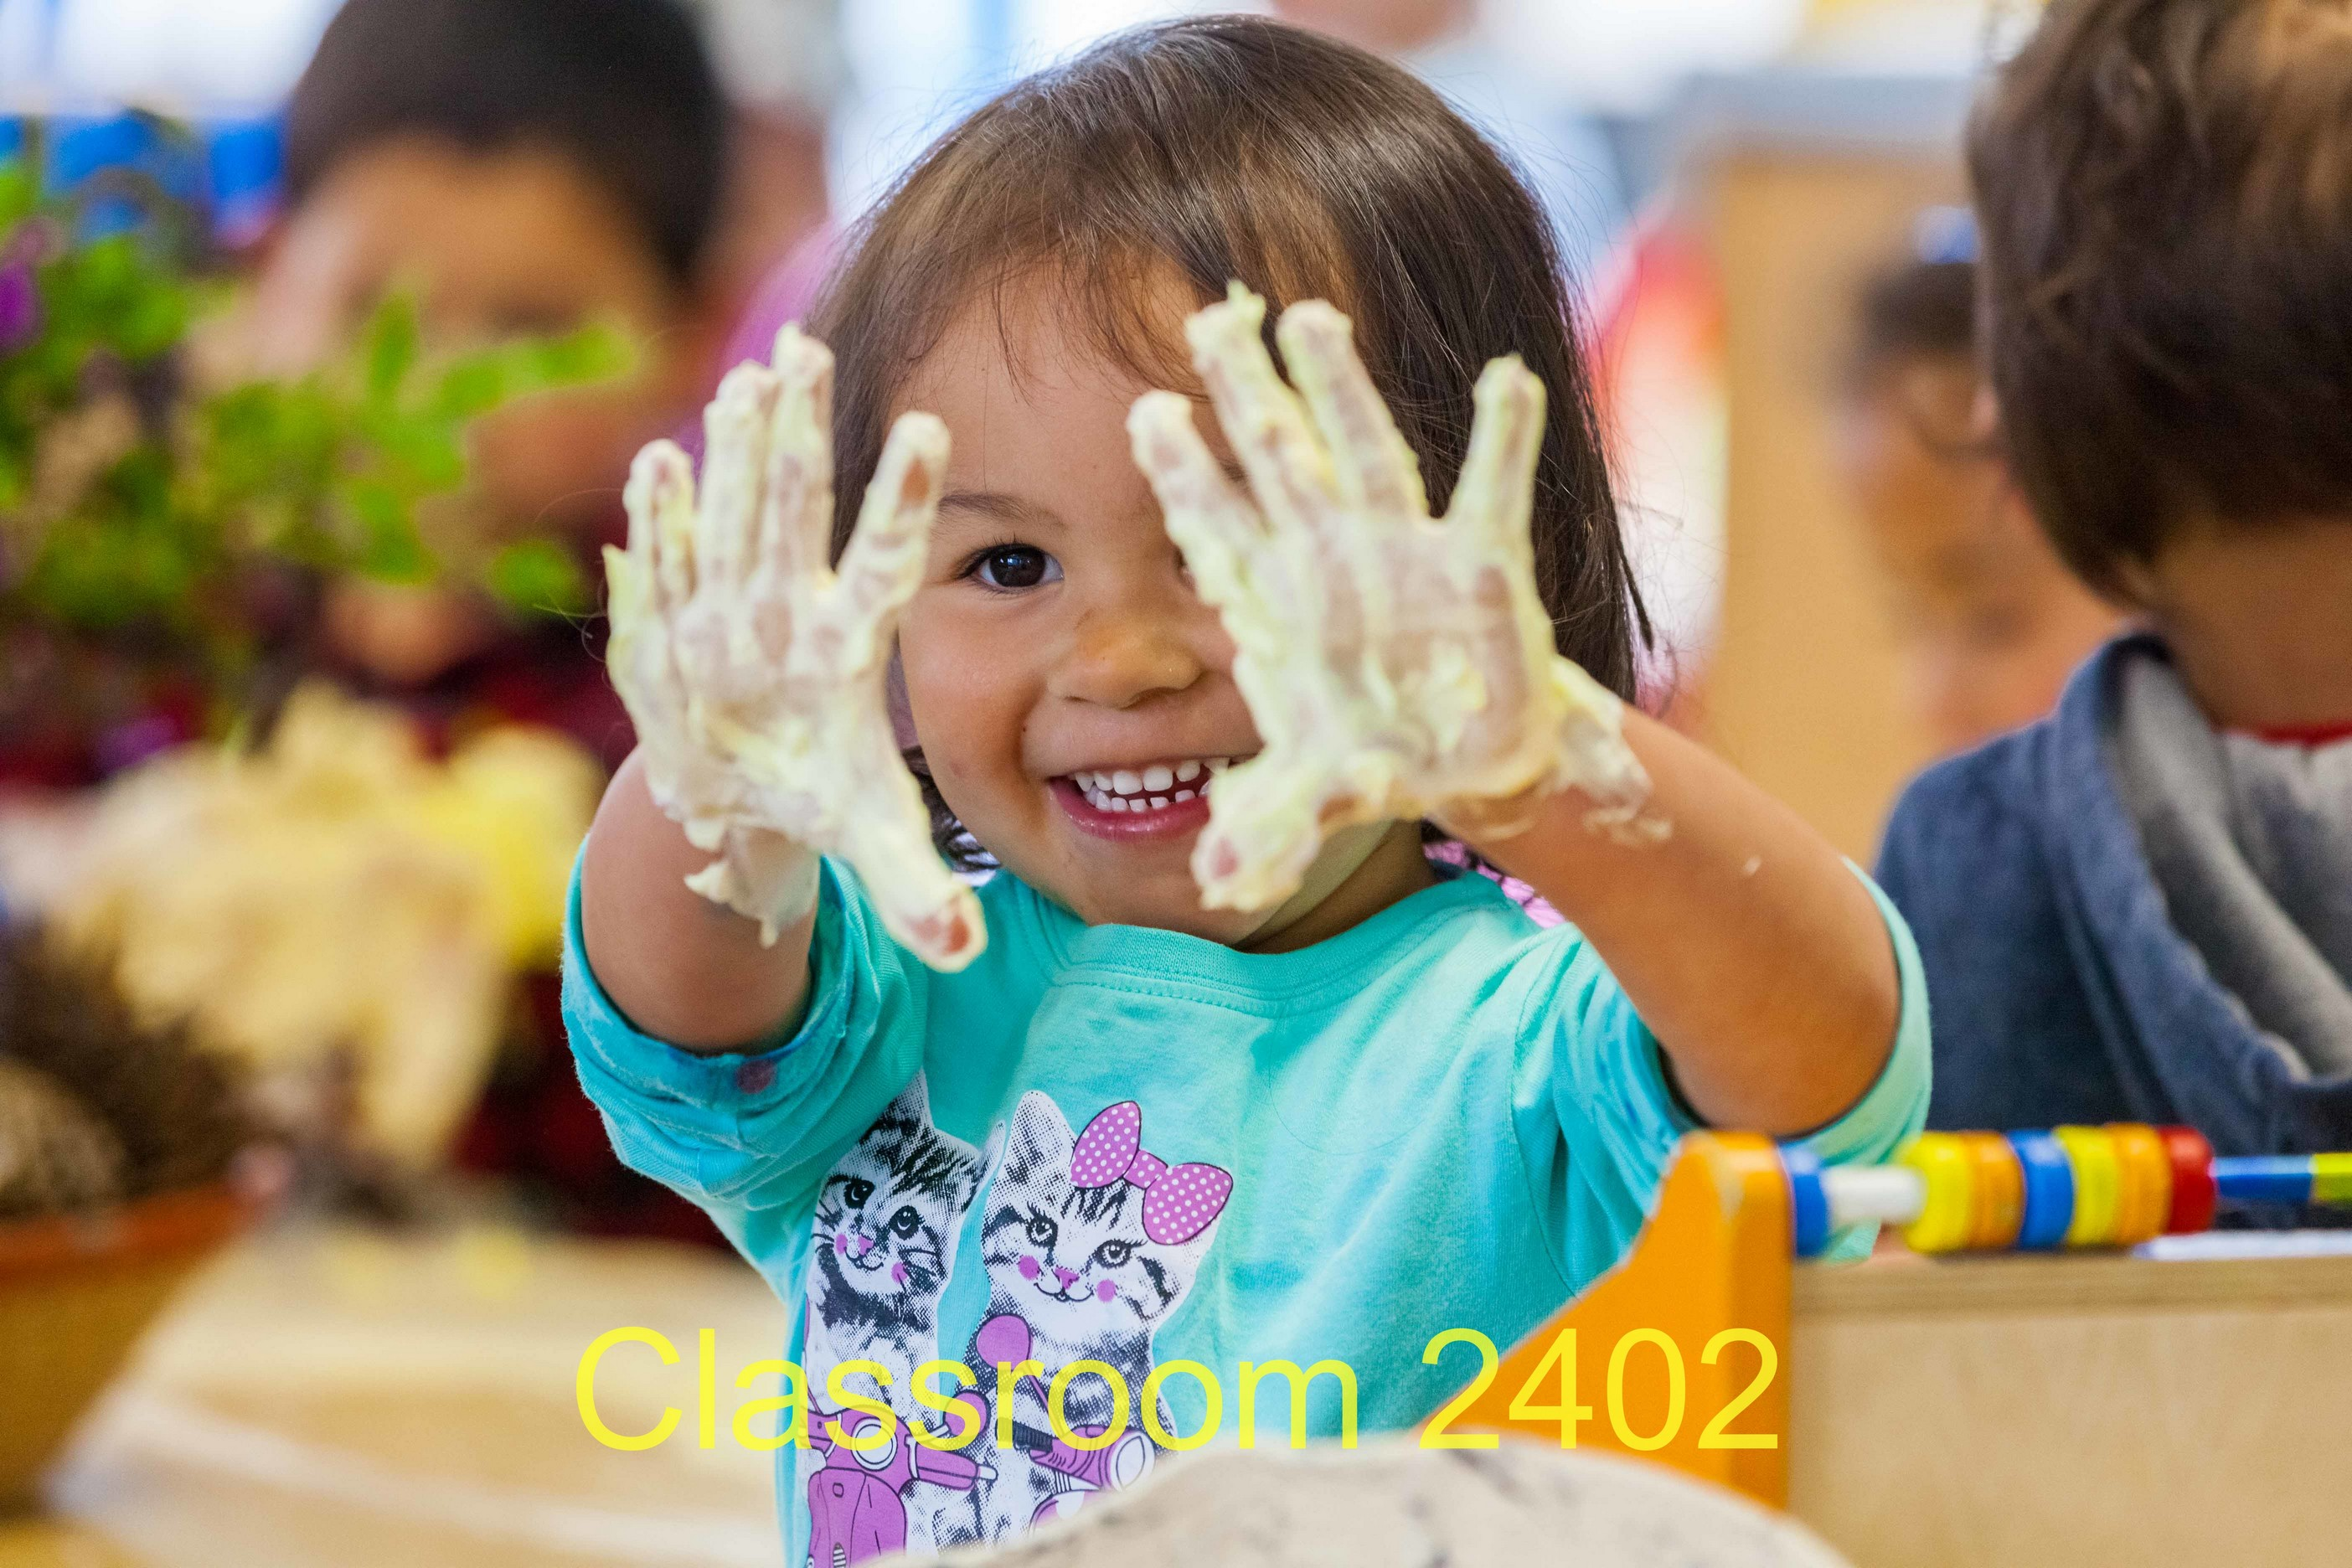 Classroom 2402